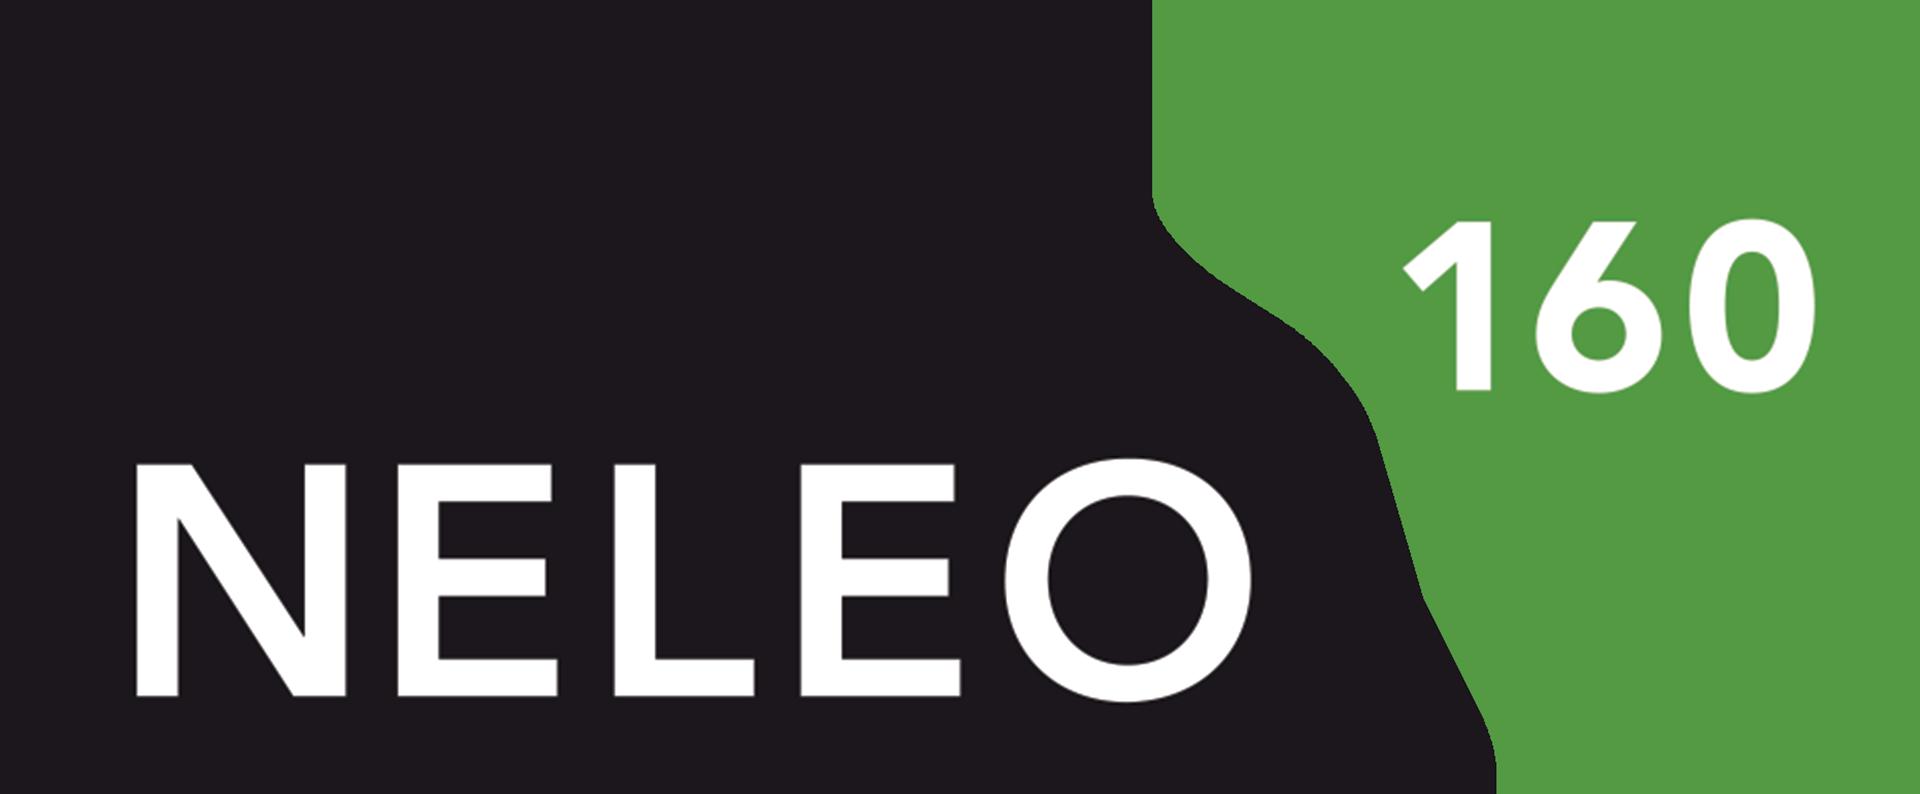 Neleo 160 Logo